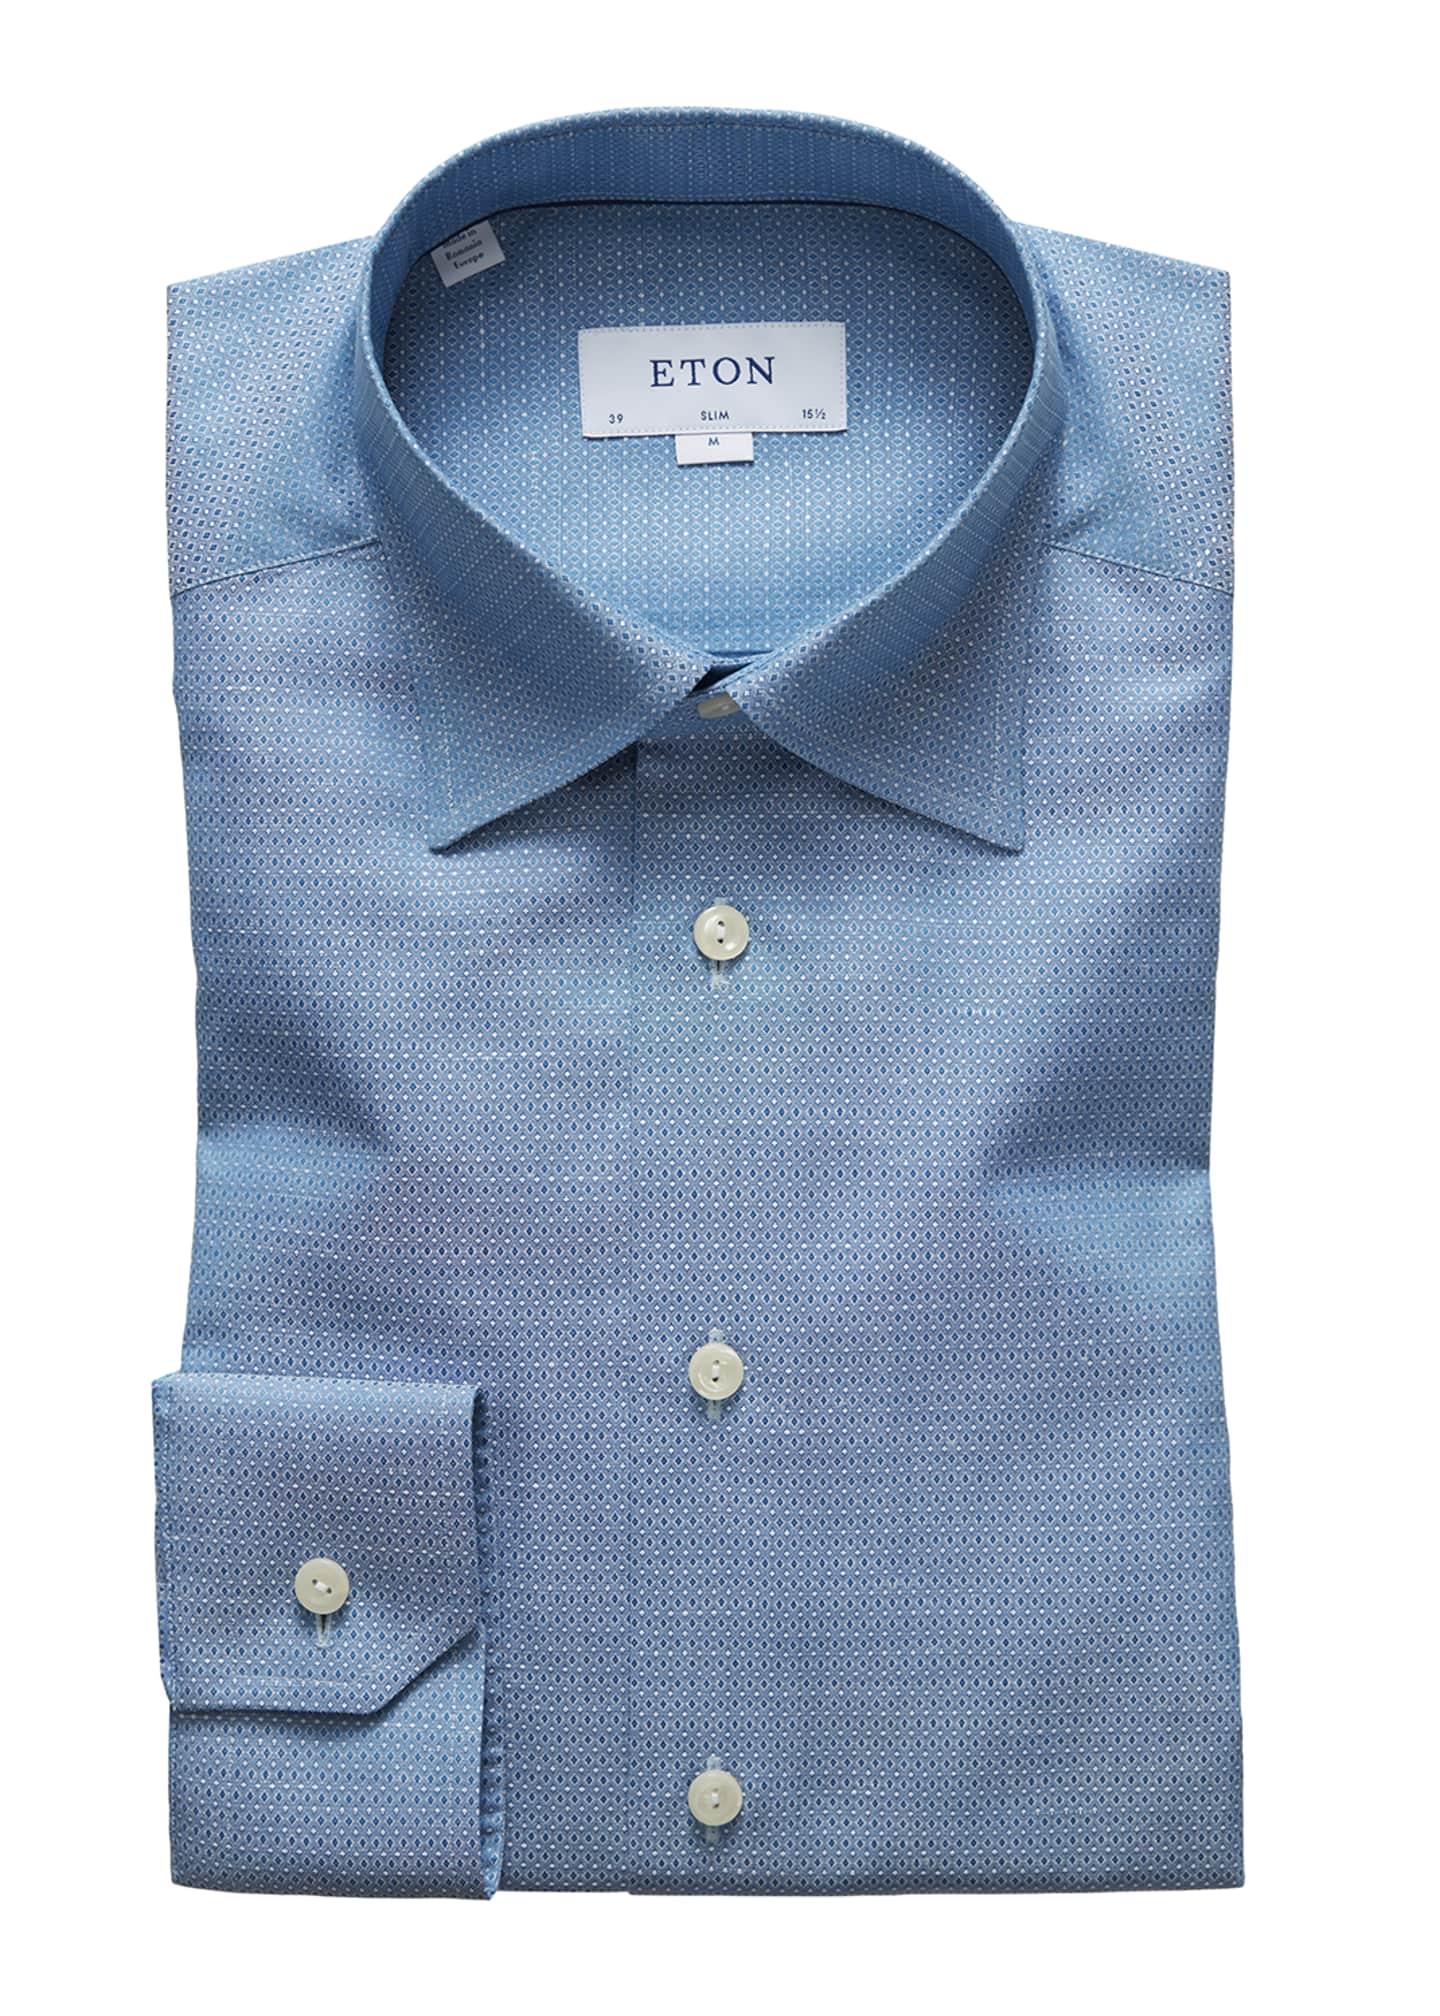 Eton Men's Textured Slim-Fit Dress Shirt